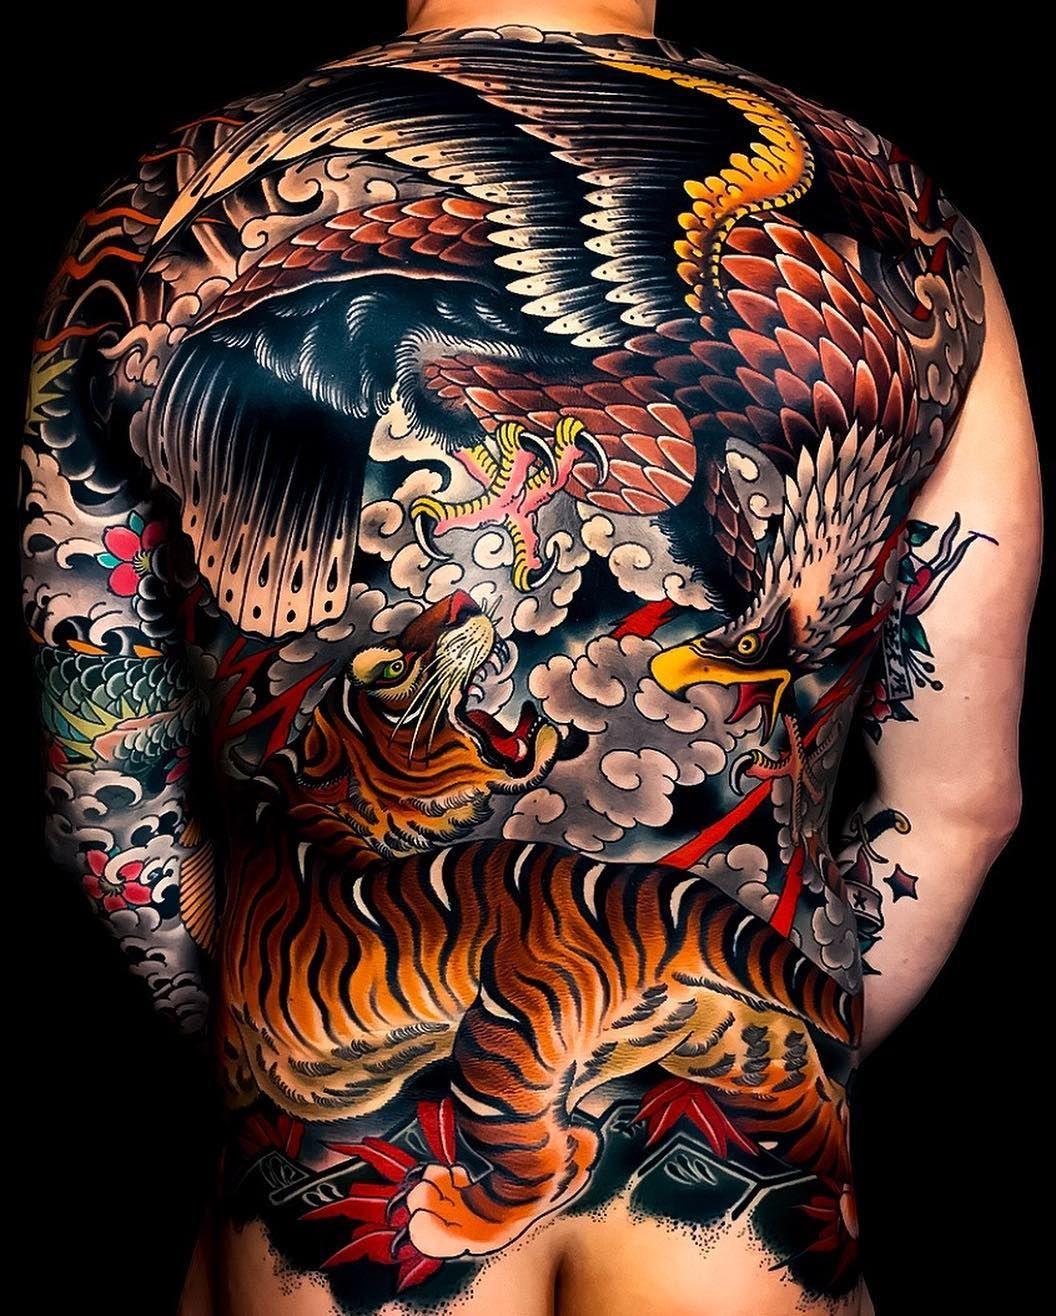 Japanese Ink On Instagram Japanese Back Tattoo By Mikerubendall Japaneseink Japanesetattoo Back Tattoos For Guys Tattoos For Guys Dragon Sleeve Tattoos